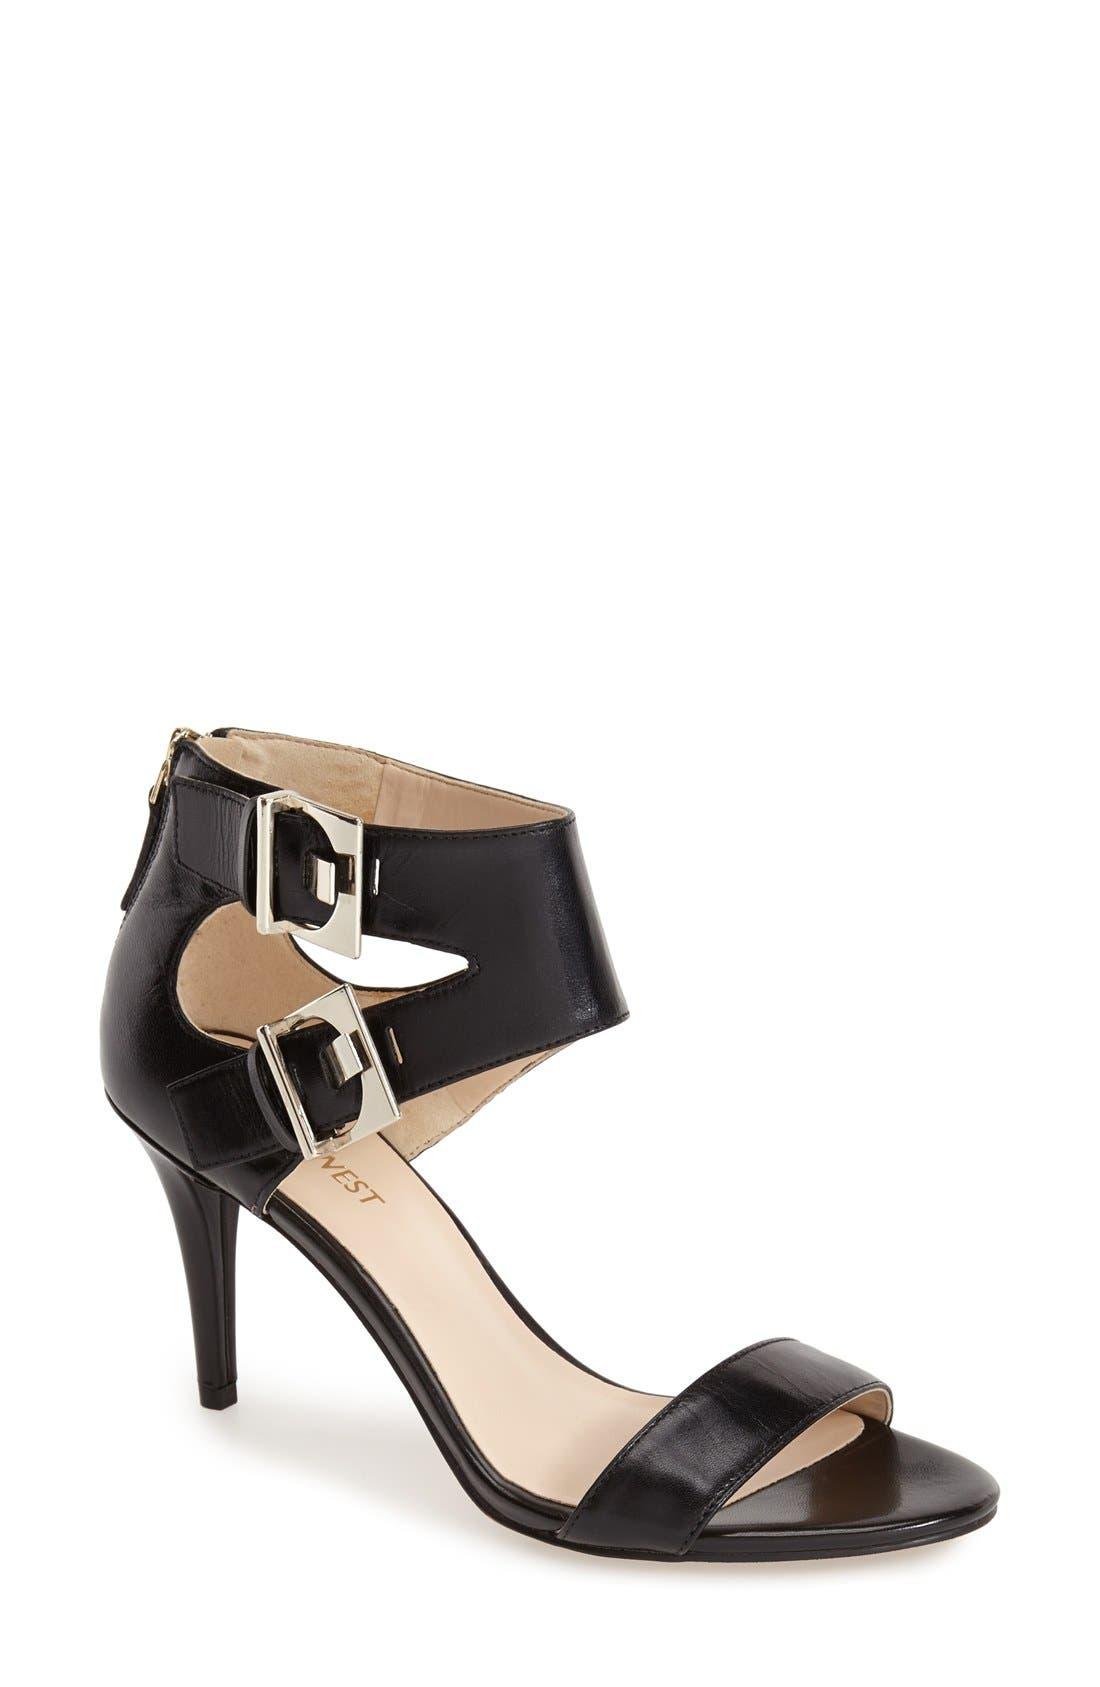 Alternate Image 1 Selected - Nine West 'Intwyne' Sandal (Women)